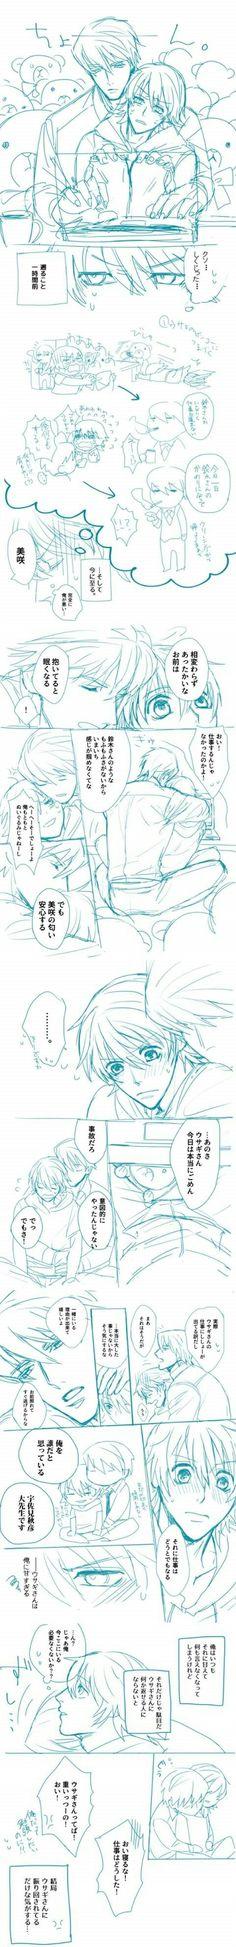 - Doujinshi ¤ Akihiko & Misaki ¤